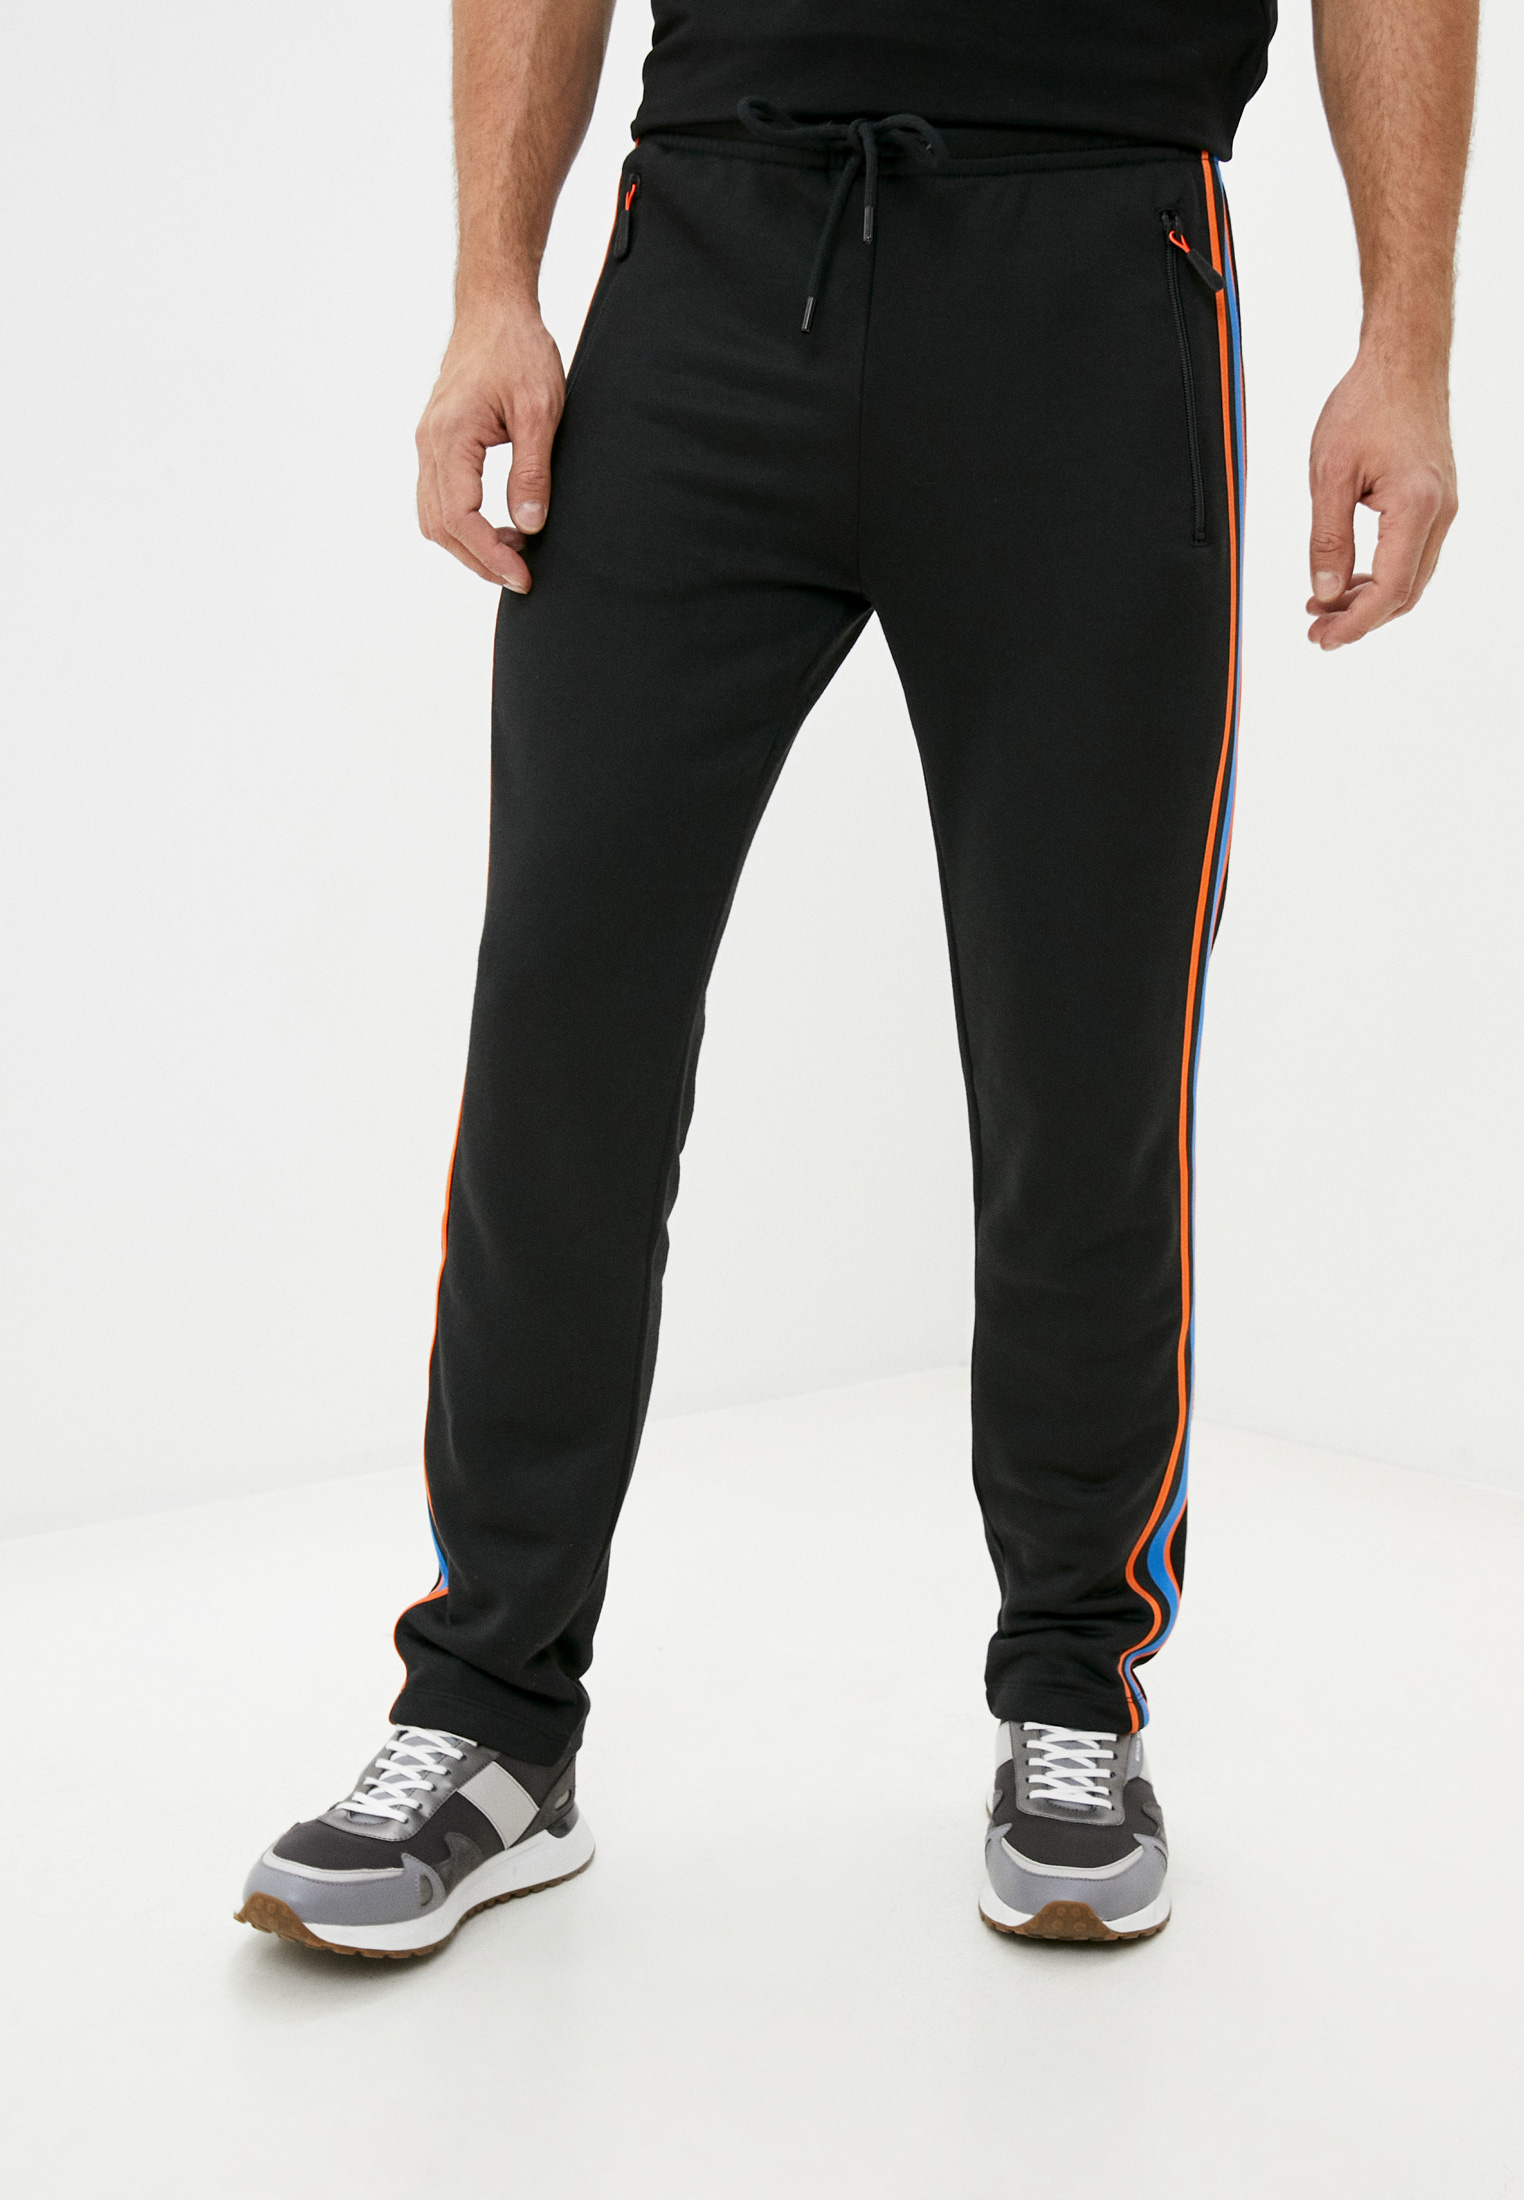 Мужские спортивные брюки Bikkembergs (Биккембергс) C 1 136 81 M 4252